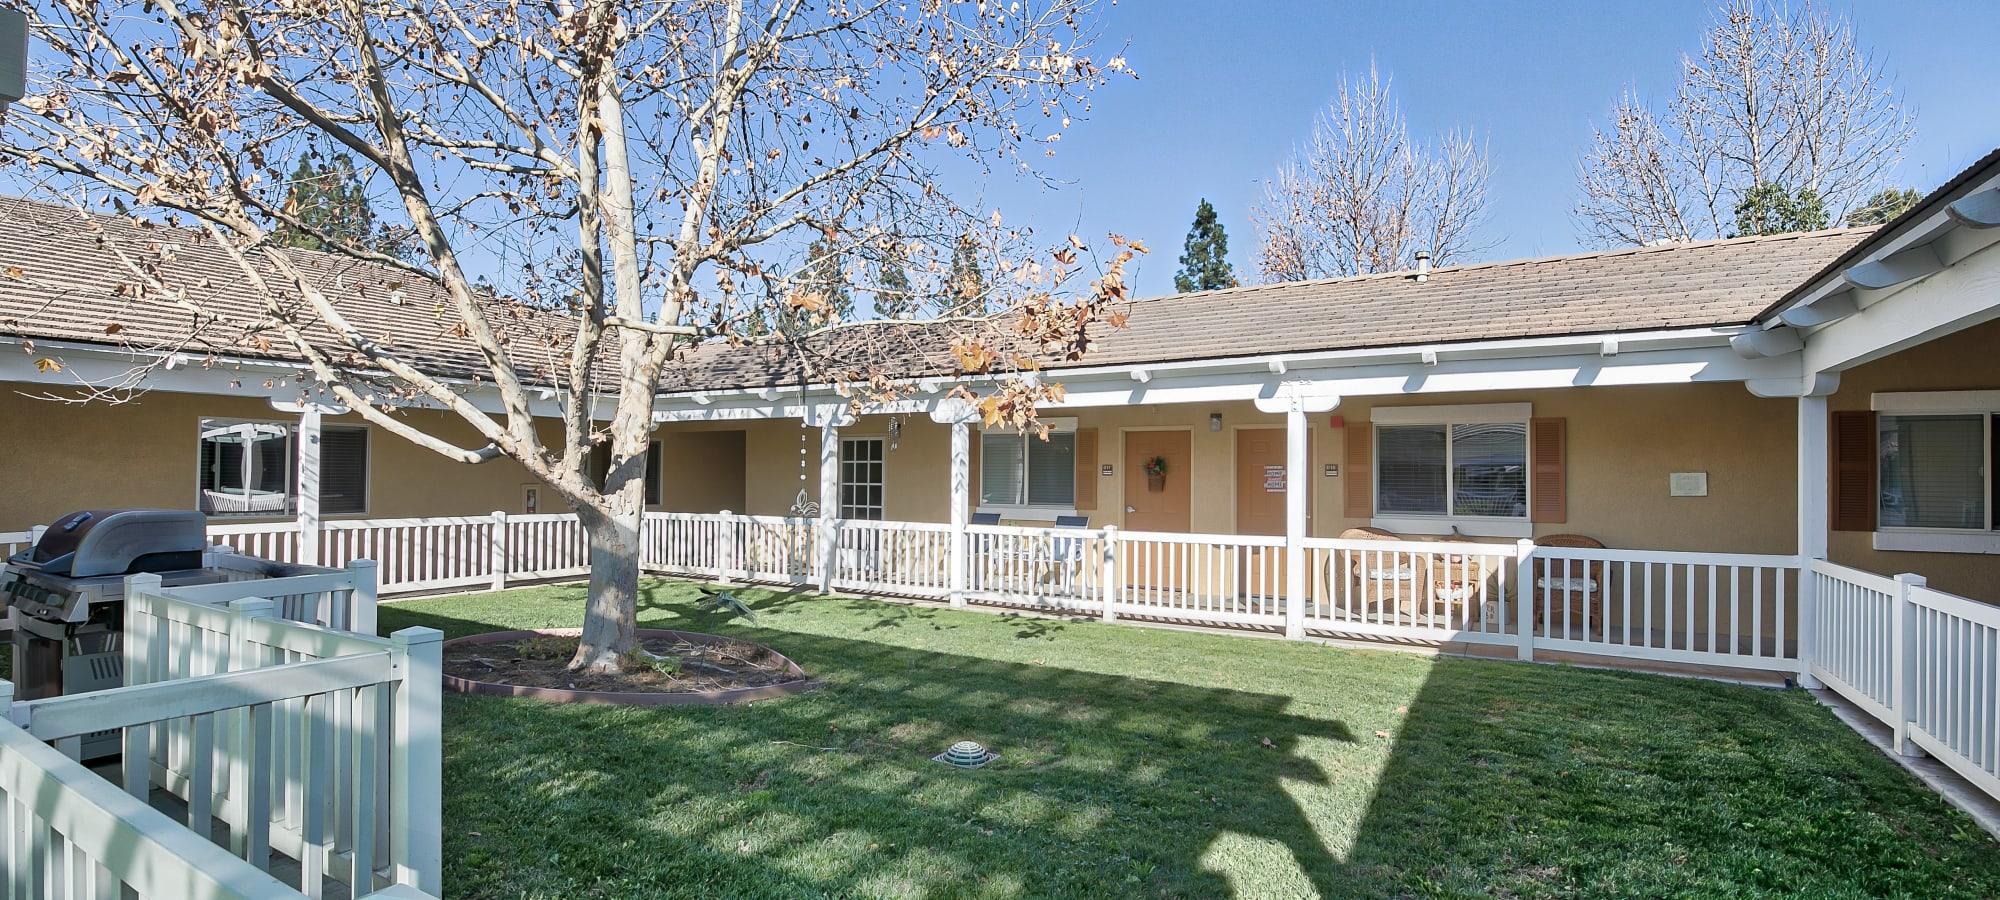 Courtyard at Sunlit Gardens in Alta Loma, California